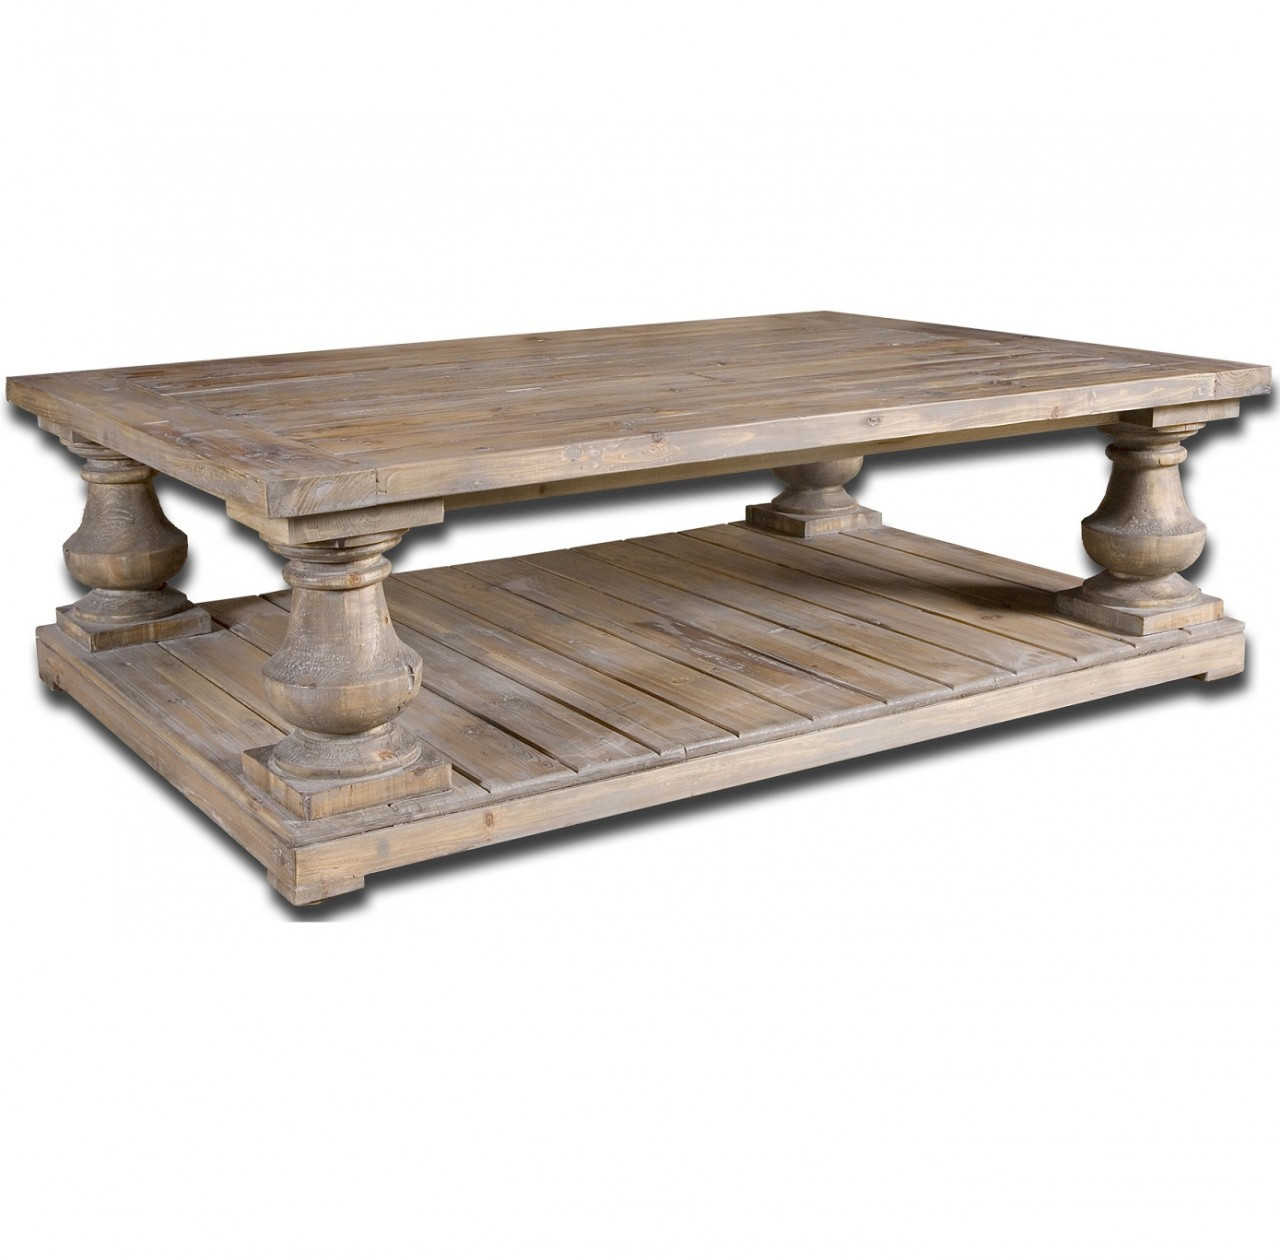 - Salvaged Wood Rustic Coffee Table 60